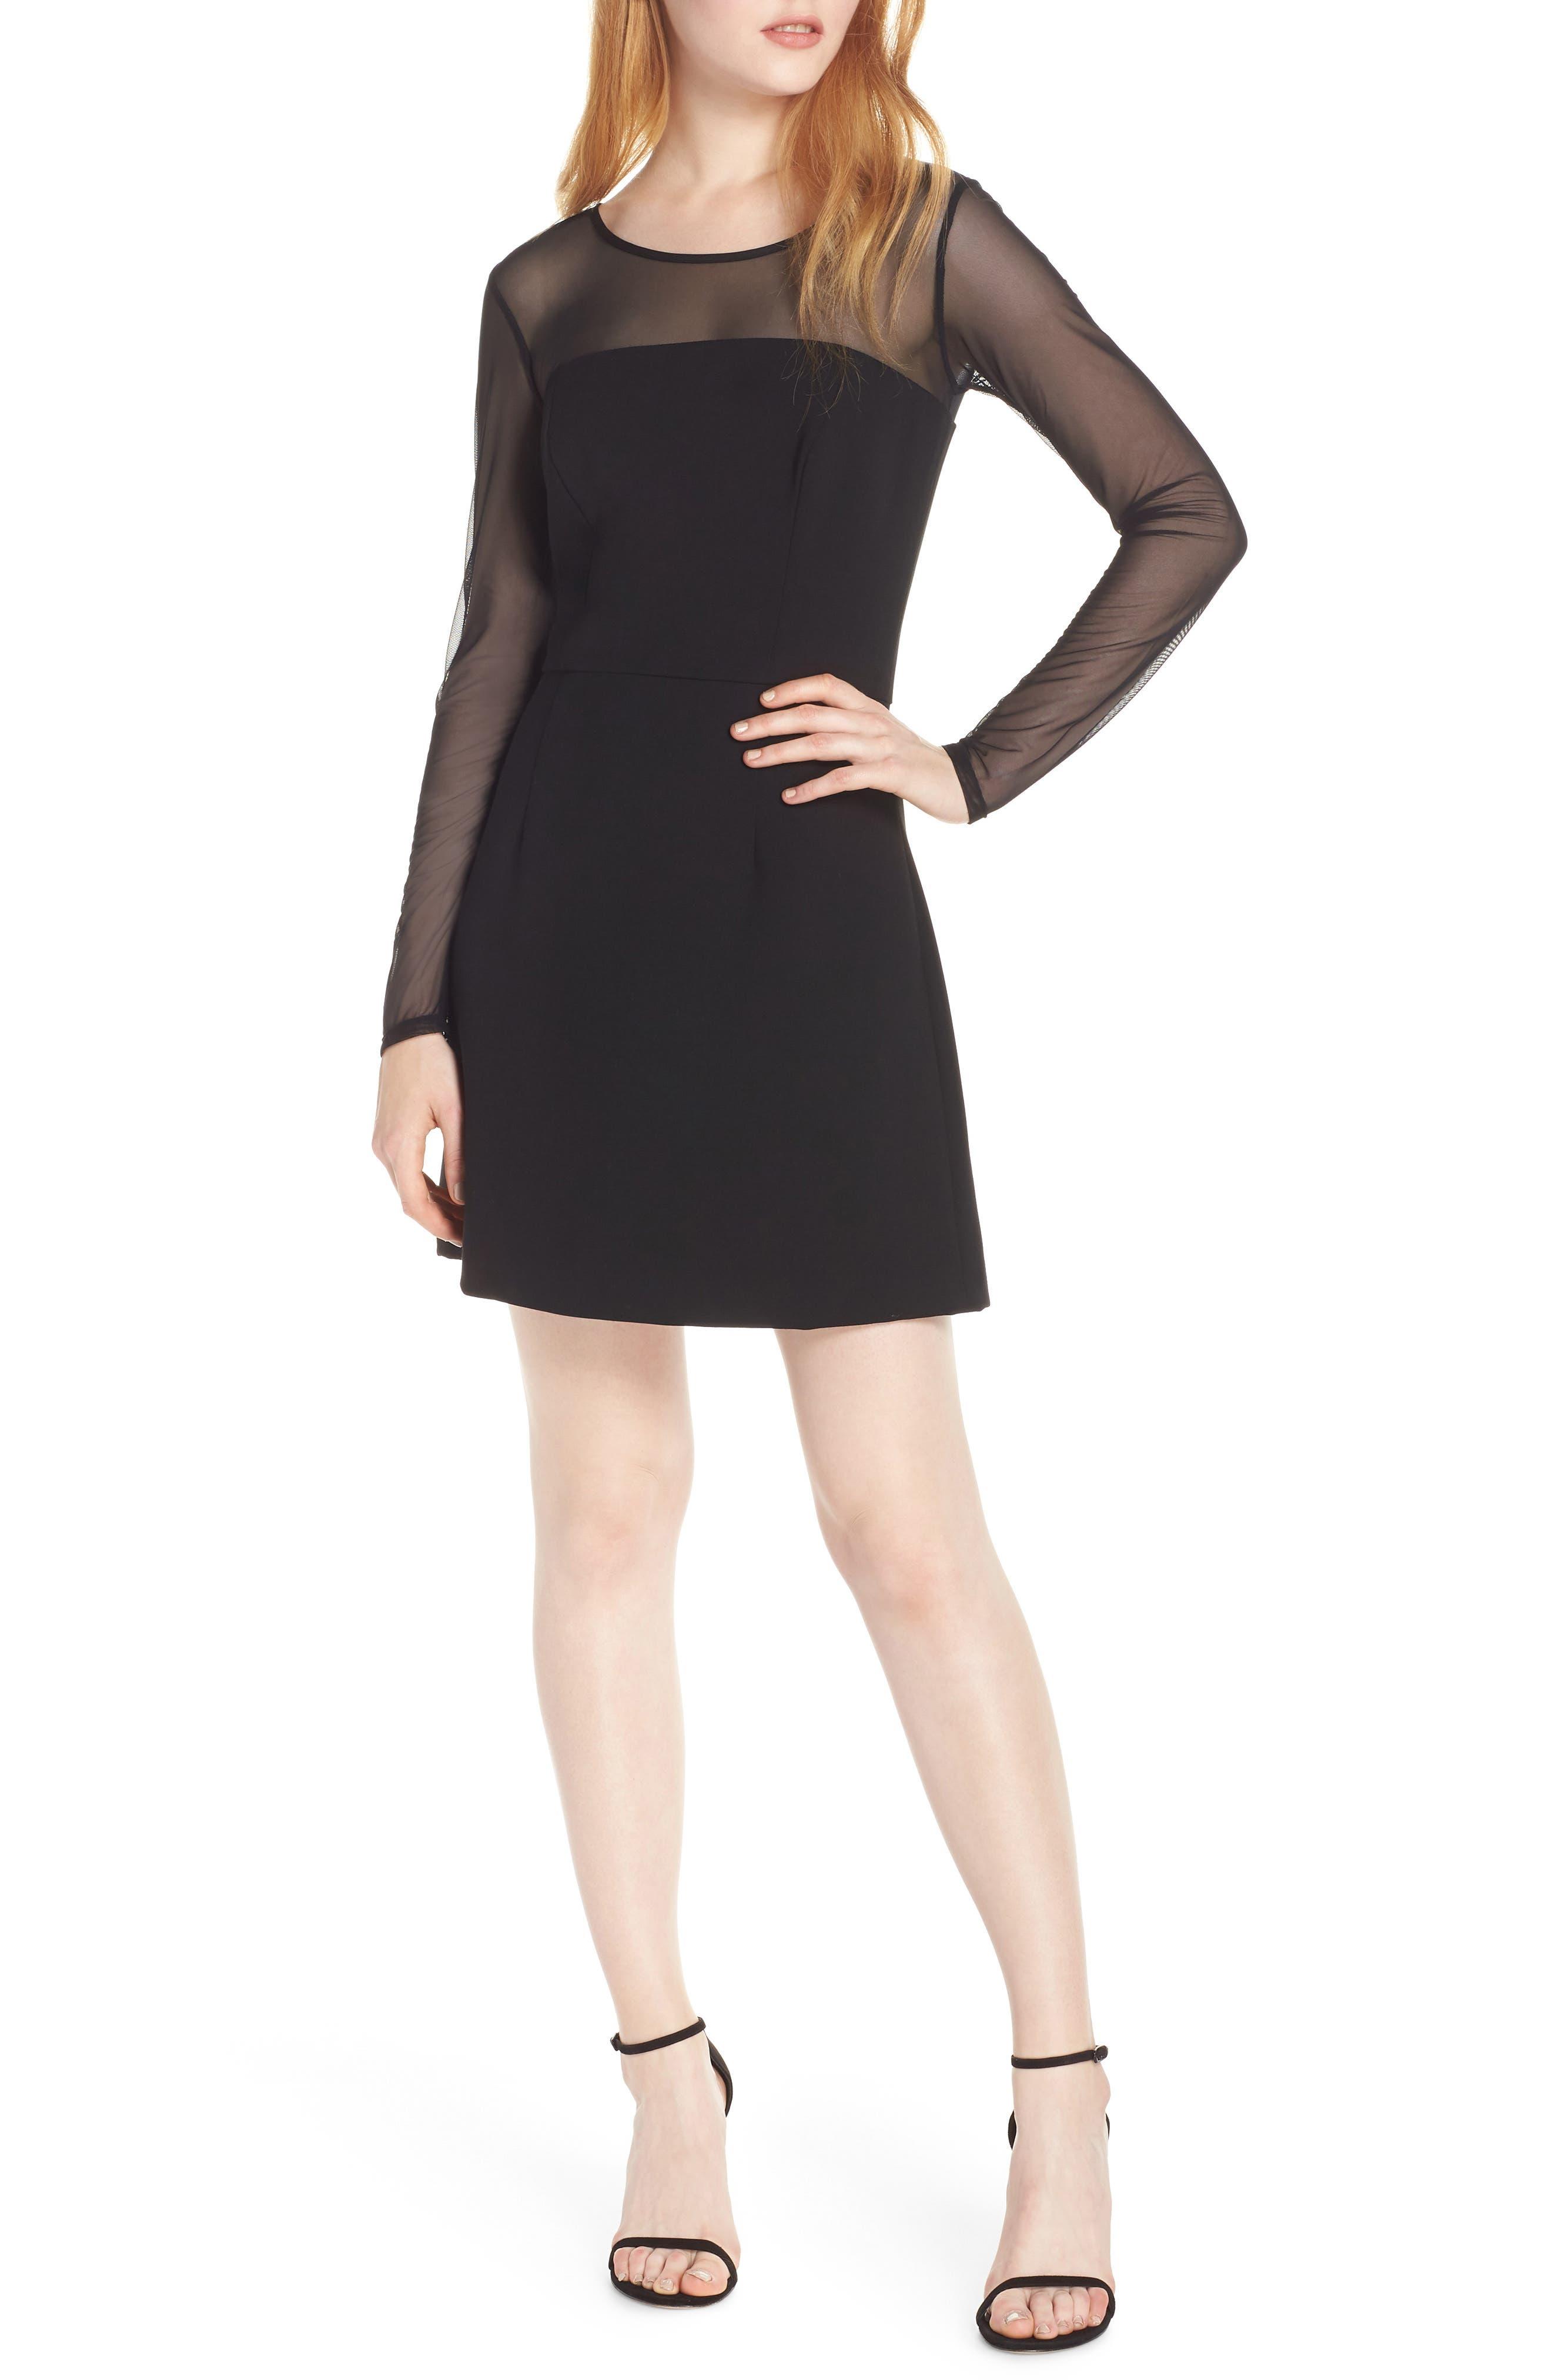 FRENCH CONNECTION Whisper Light Mesh Sleeve Dress, Main, color, BLACK